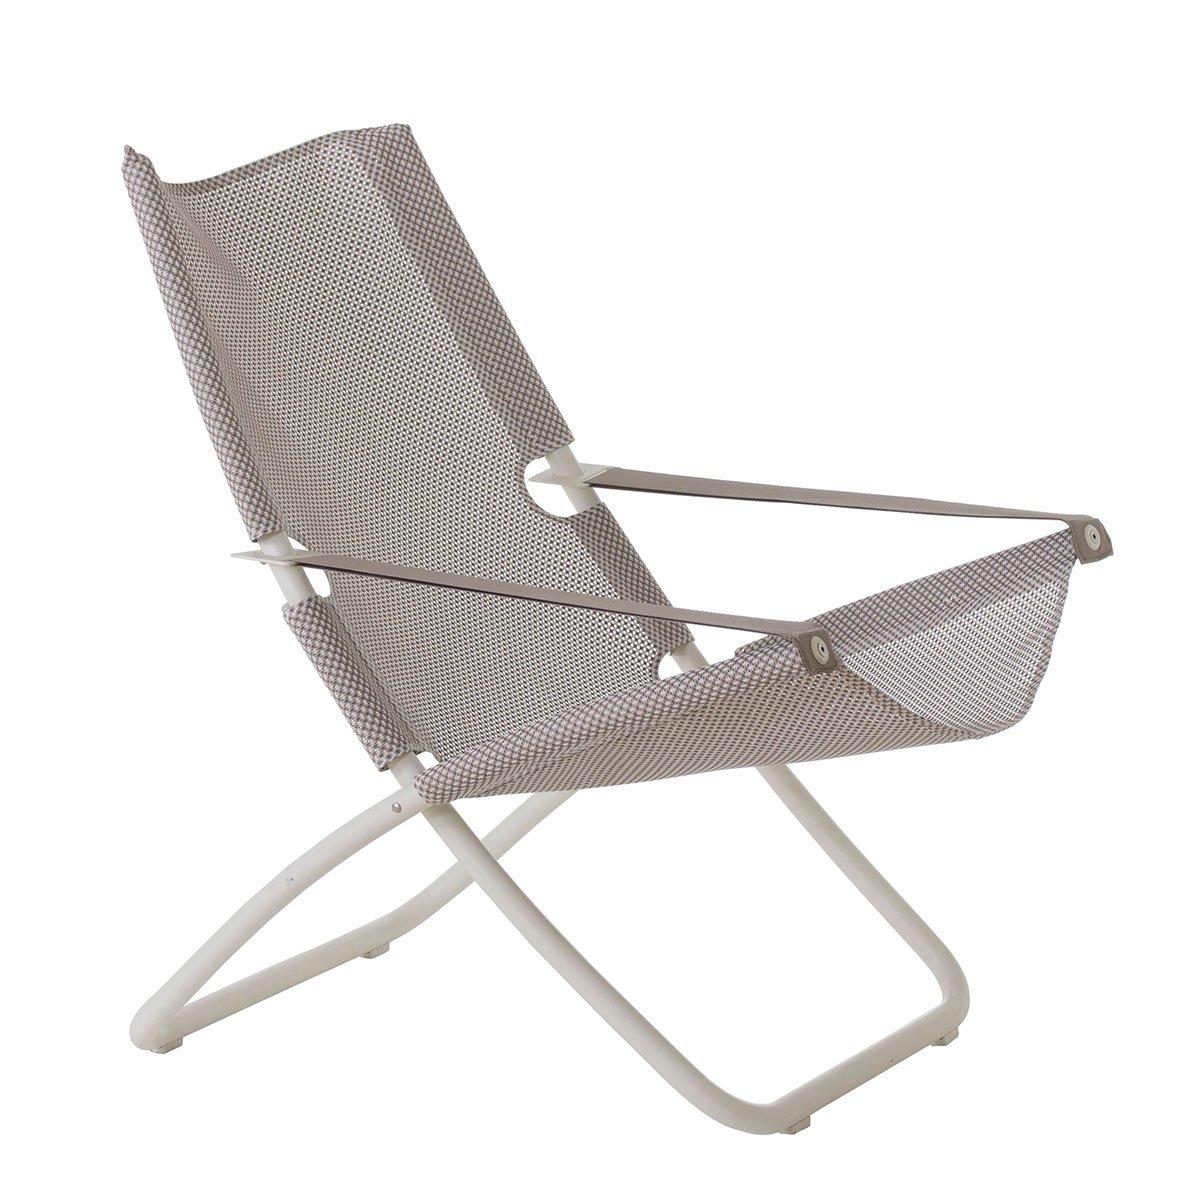 Snooze folding Deck Chair Emu Item 201 Color Wyite Cod 23 Jersey Tex